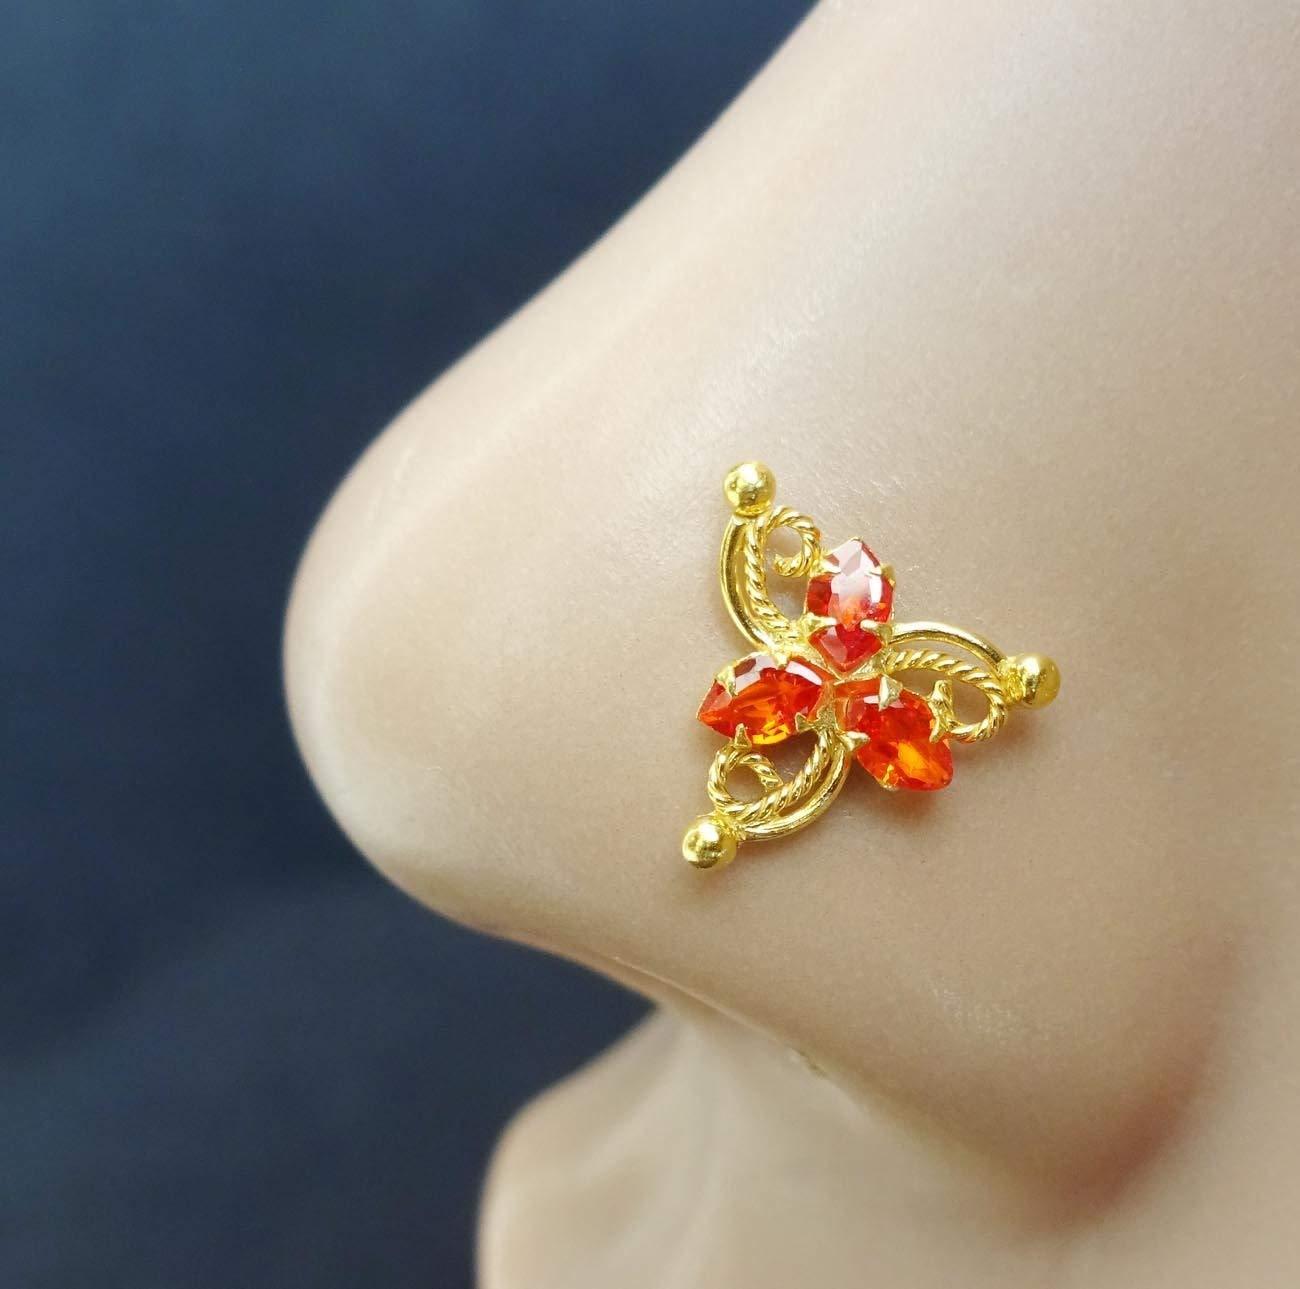 Orange Stone Gold Nose Ring,Crystal Diamond Piercing,Bollywood Nose Ring,CZ Simulated Diamond Piercing, Monroe Piercing,Crock Screw Nose Stud,Flower Nose Stud,Indian Nose Piercing(TEJ621)